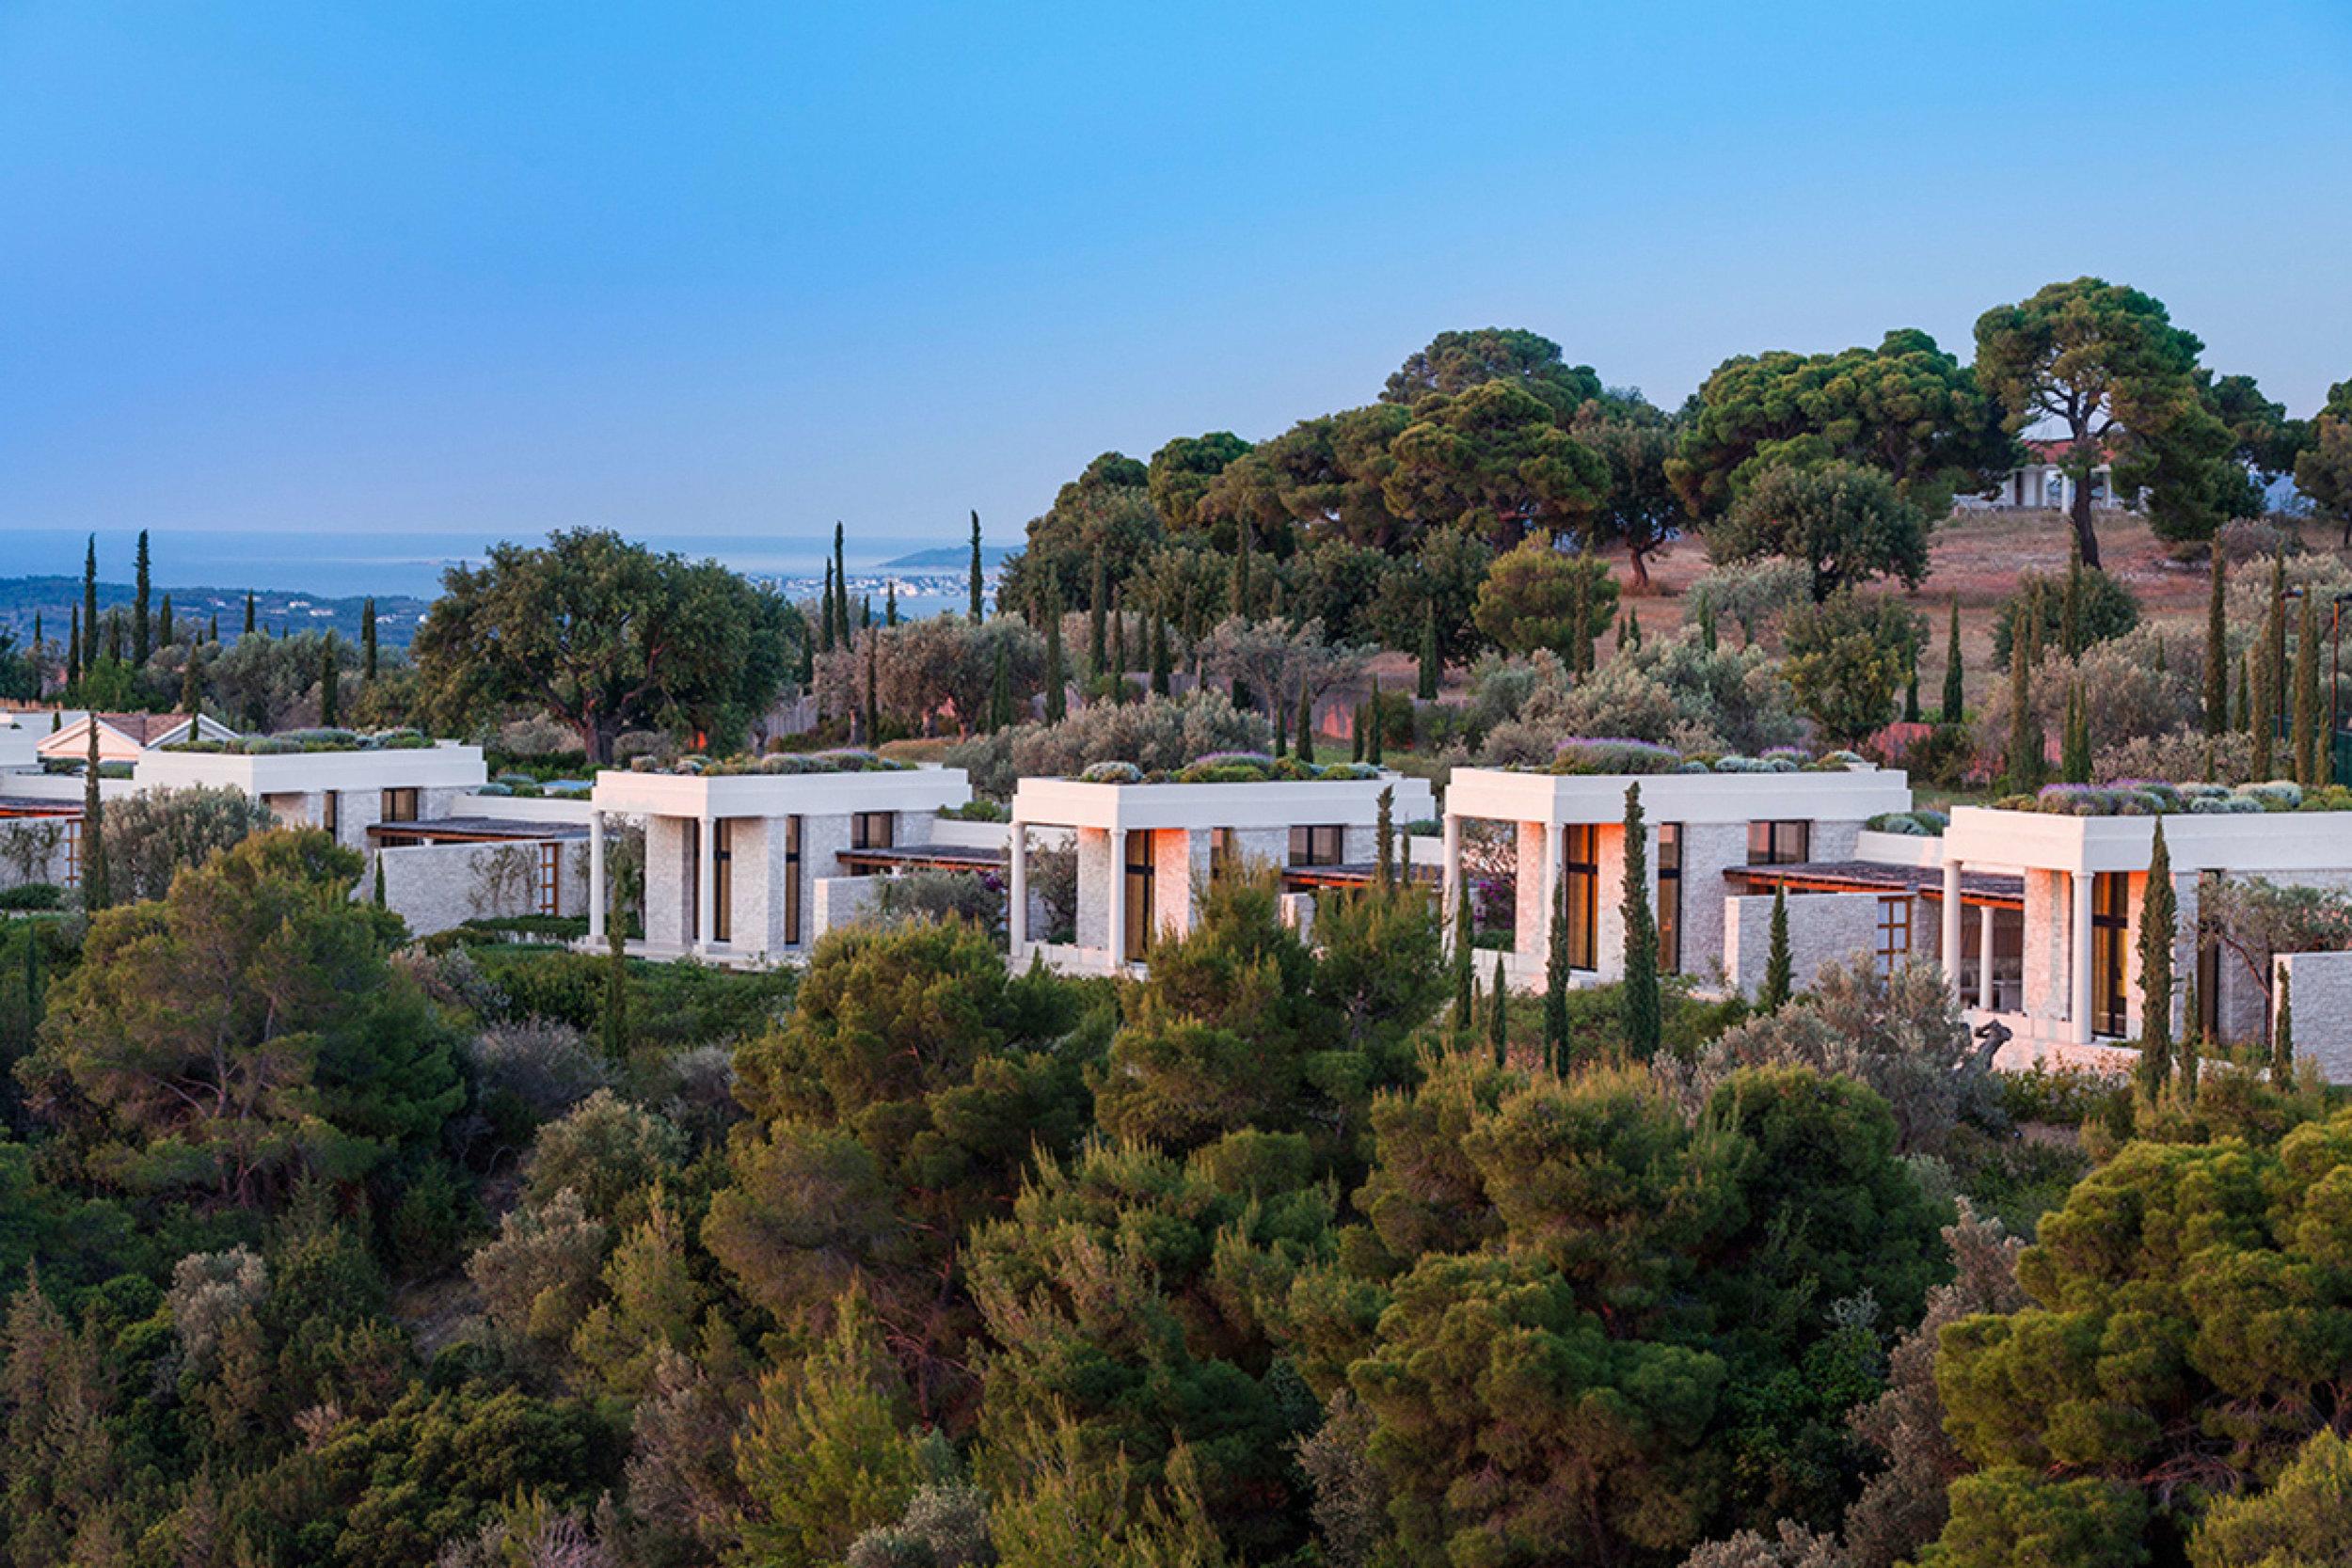 amanzoe-pavilions-aerial-view-1200x800.jpg